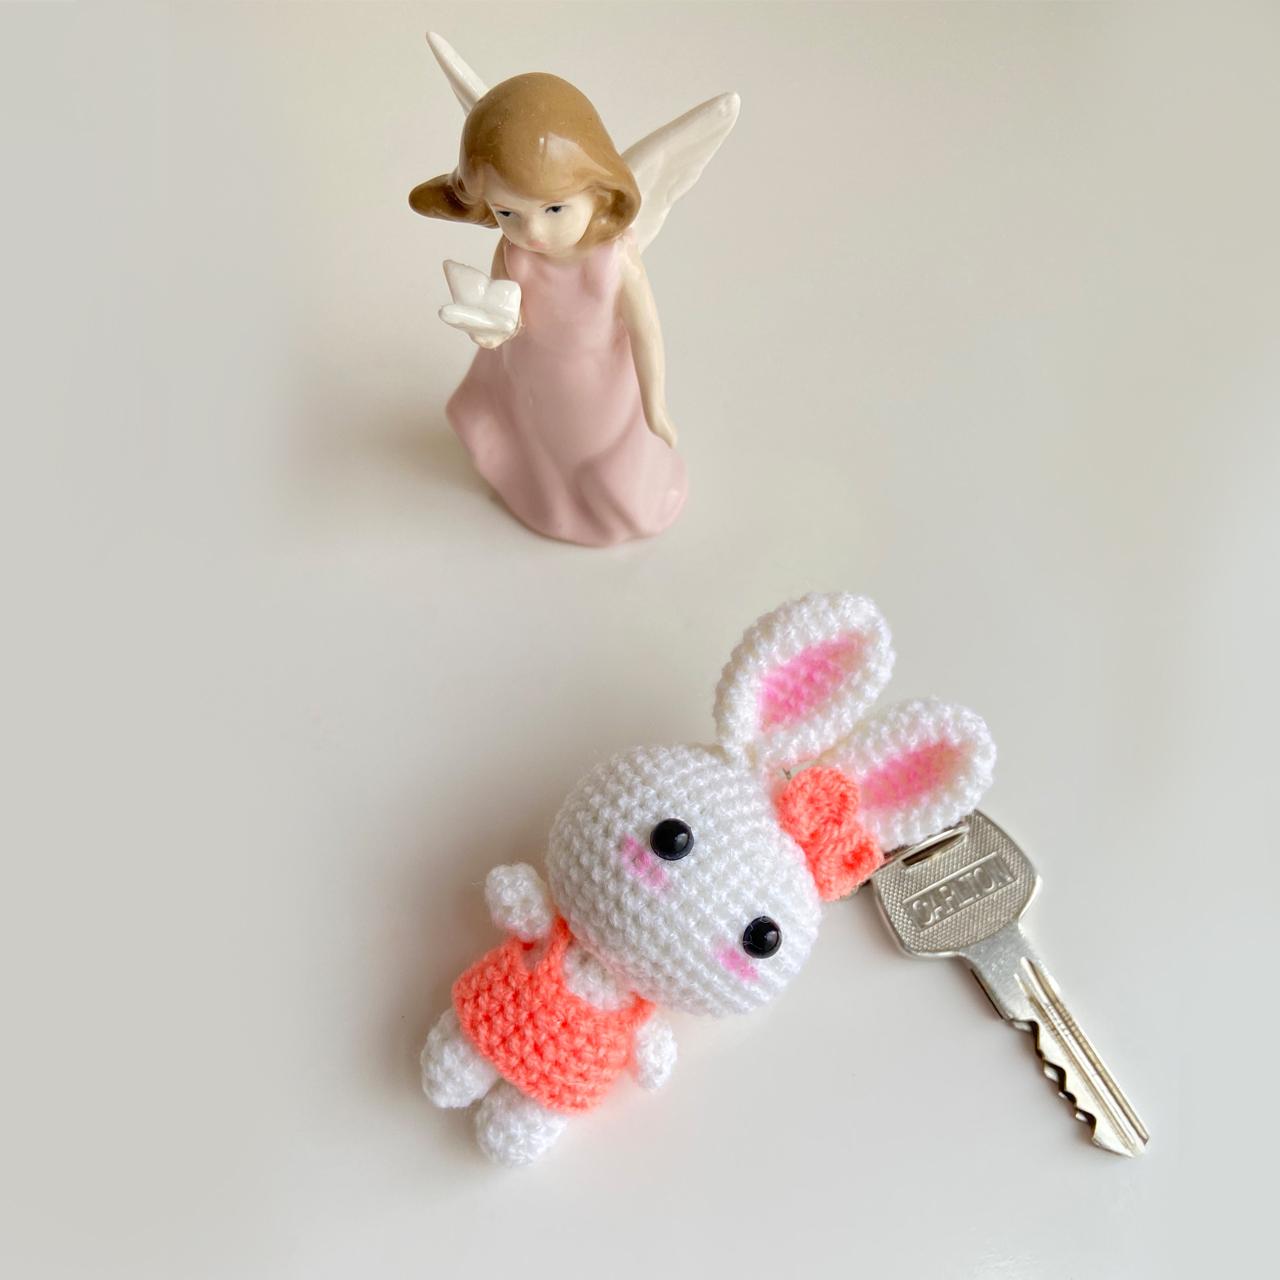 خرید                      جاکلیدی طرح خرگوش کد 1